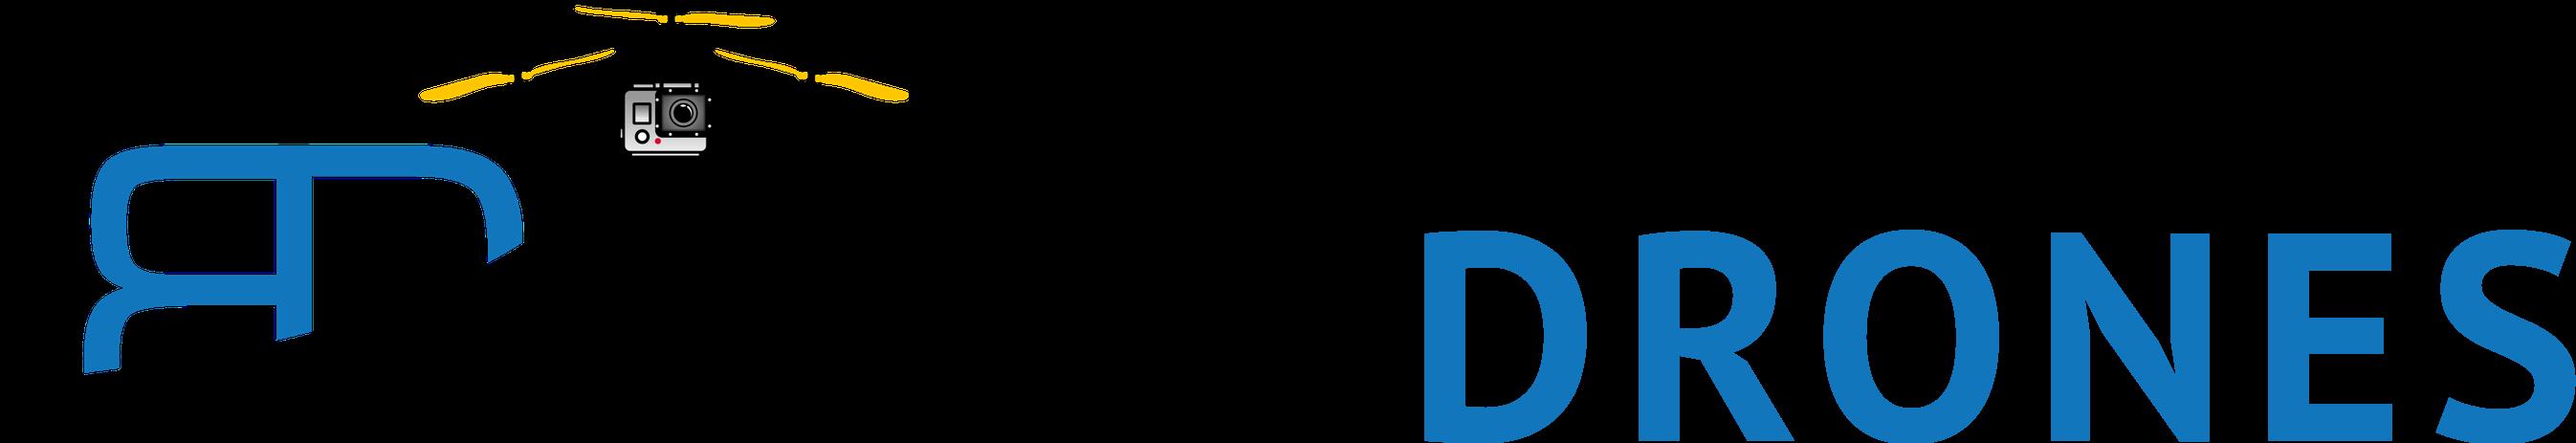 Bristol Drones Ltd Retina Logo